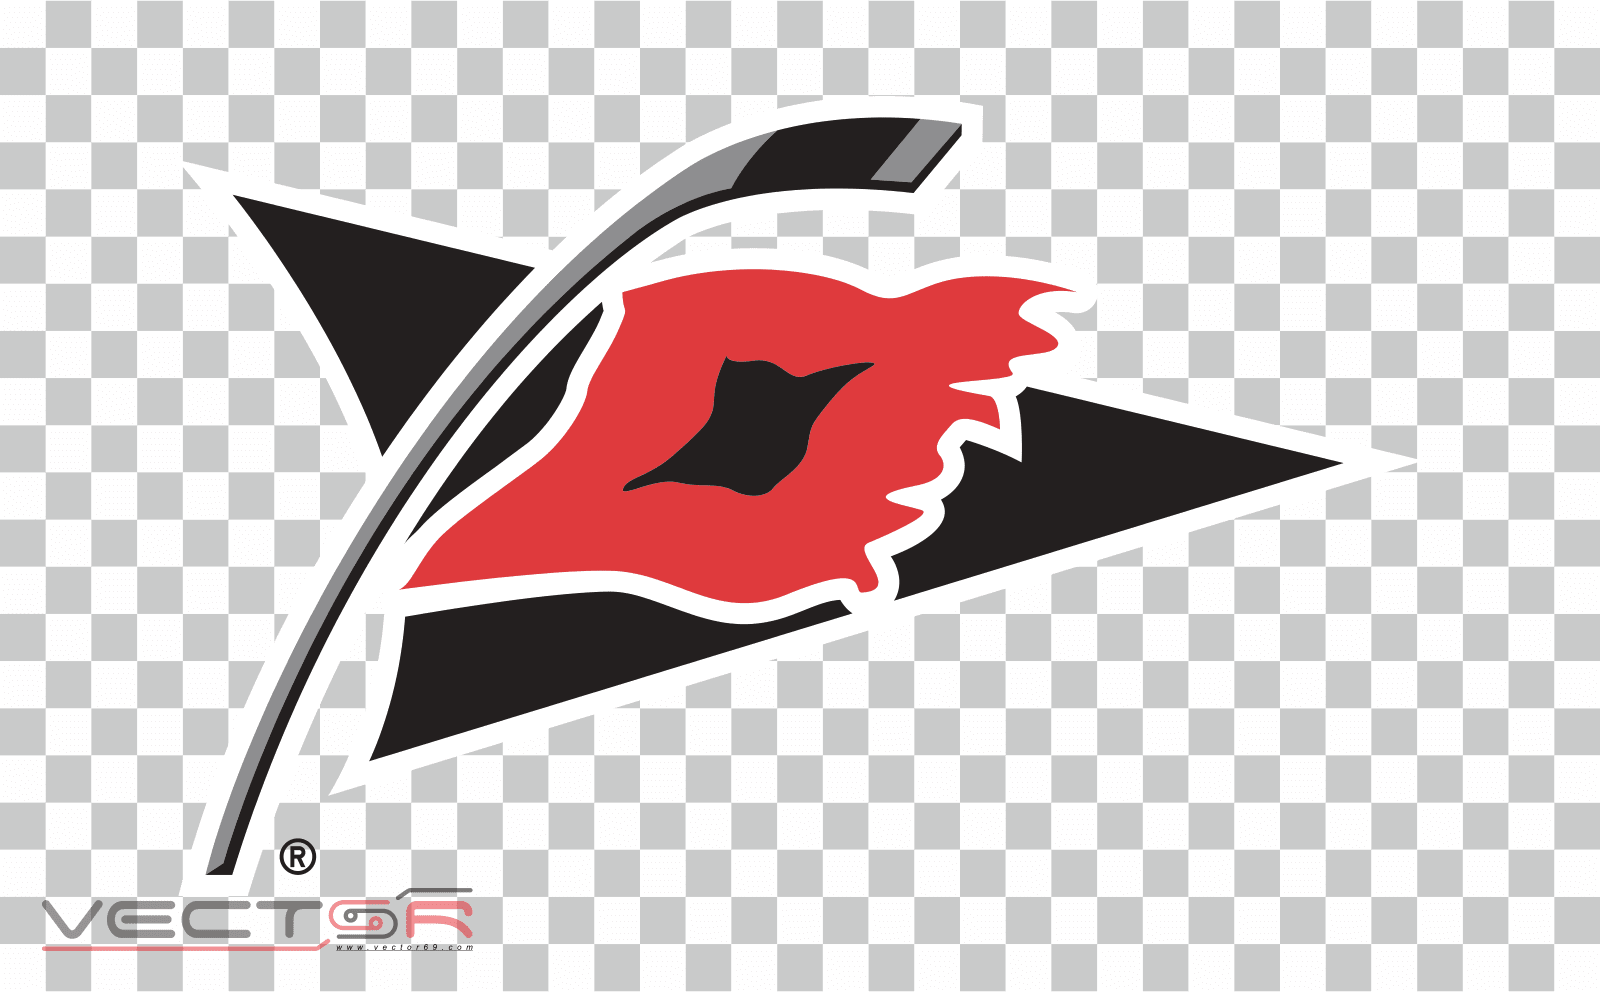 Carolina Hurricanes (1999) Secondary Logo - Download .PNG (Portable Network Graphics) Transparent Images